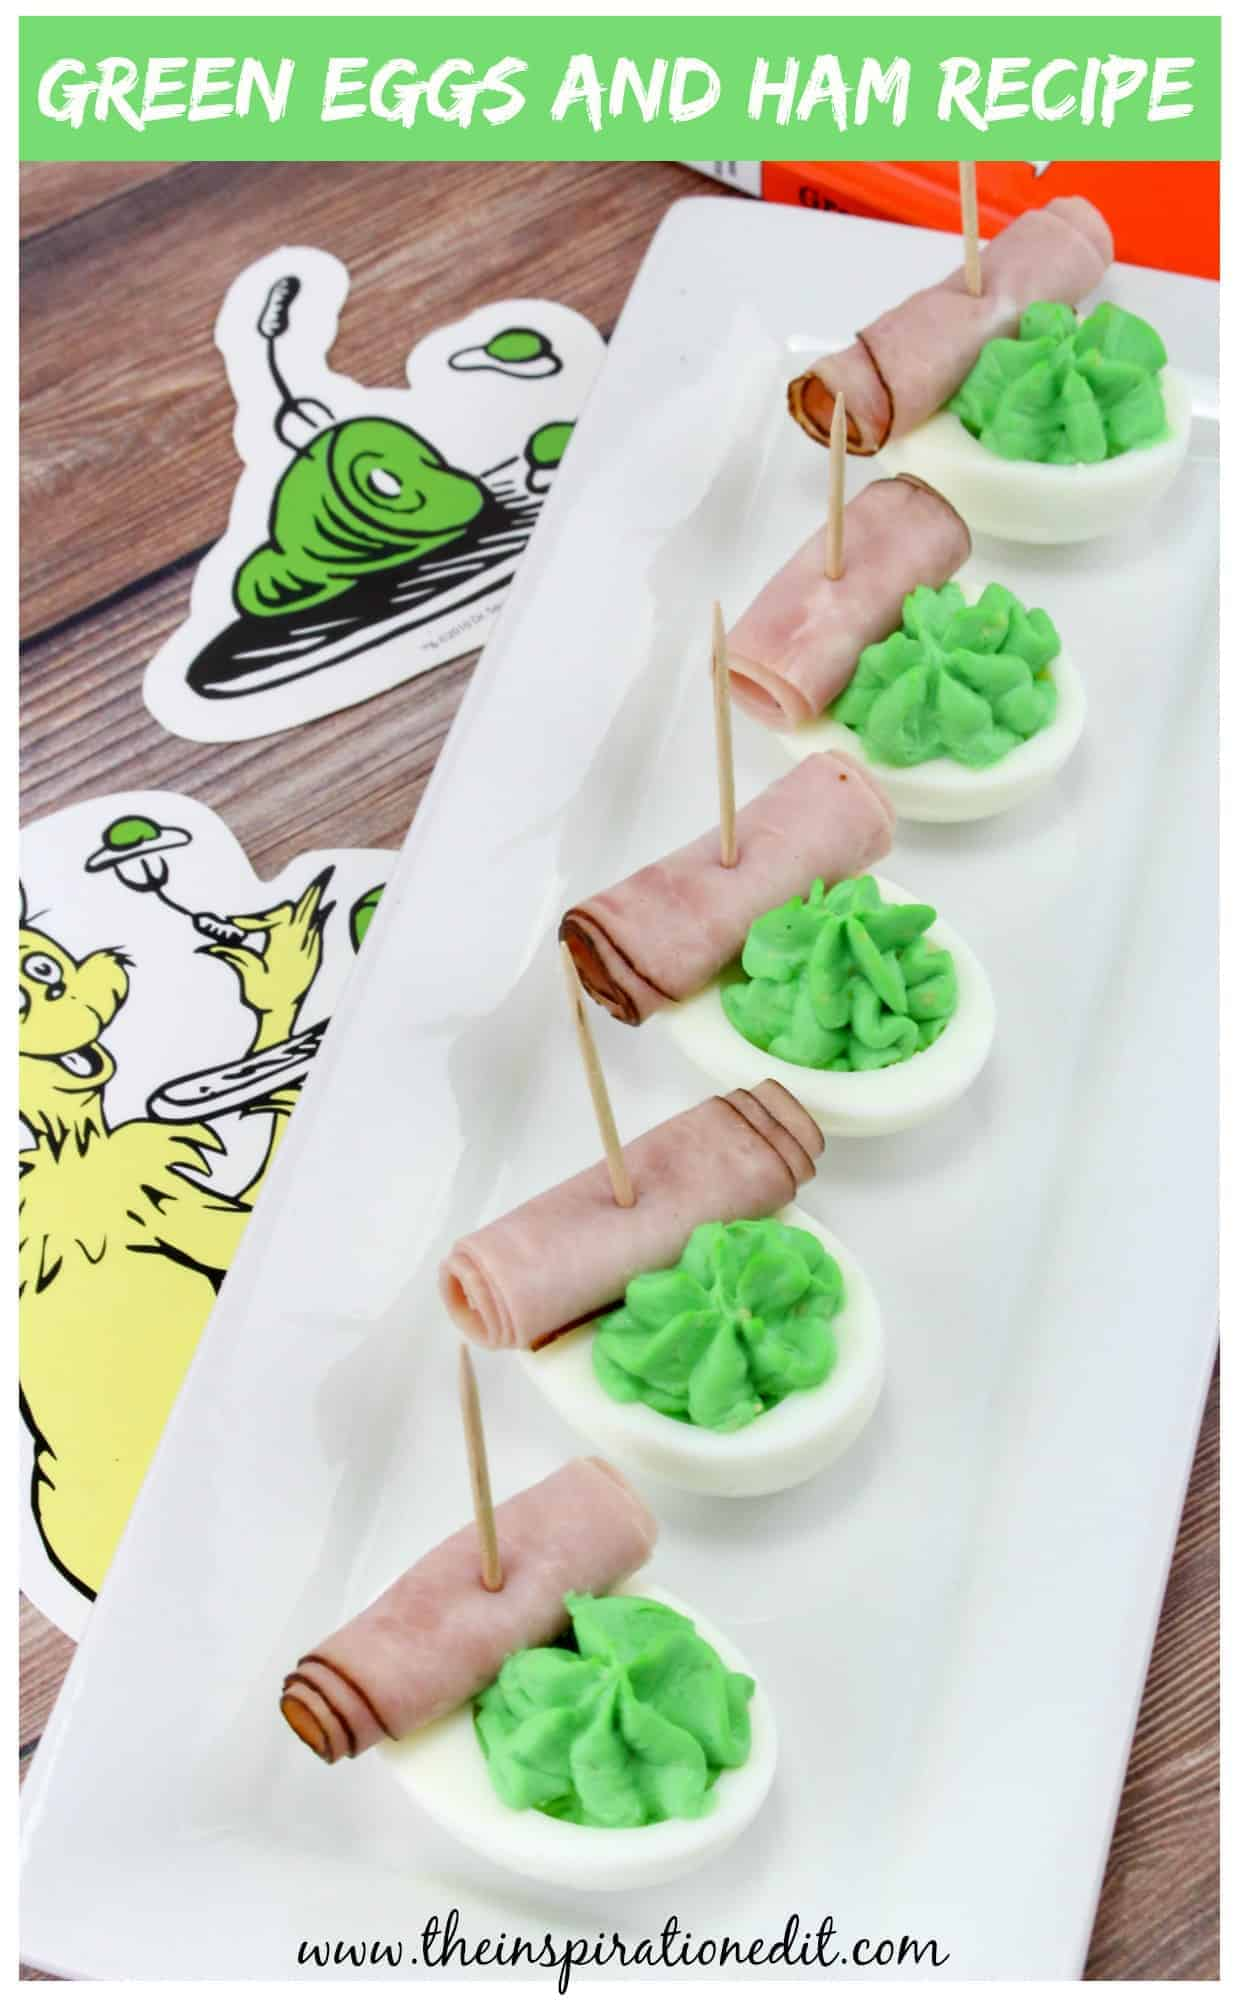 green eggs and ham recipe